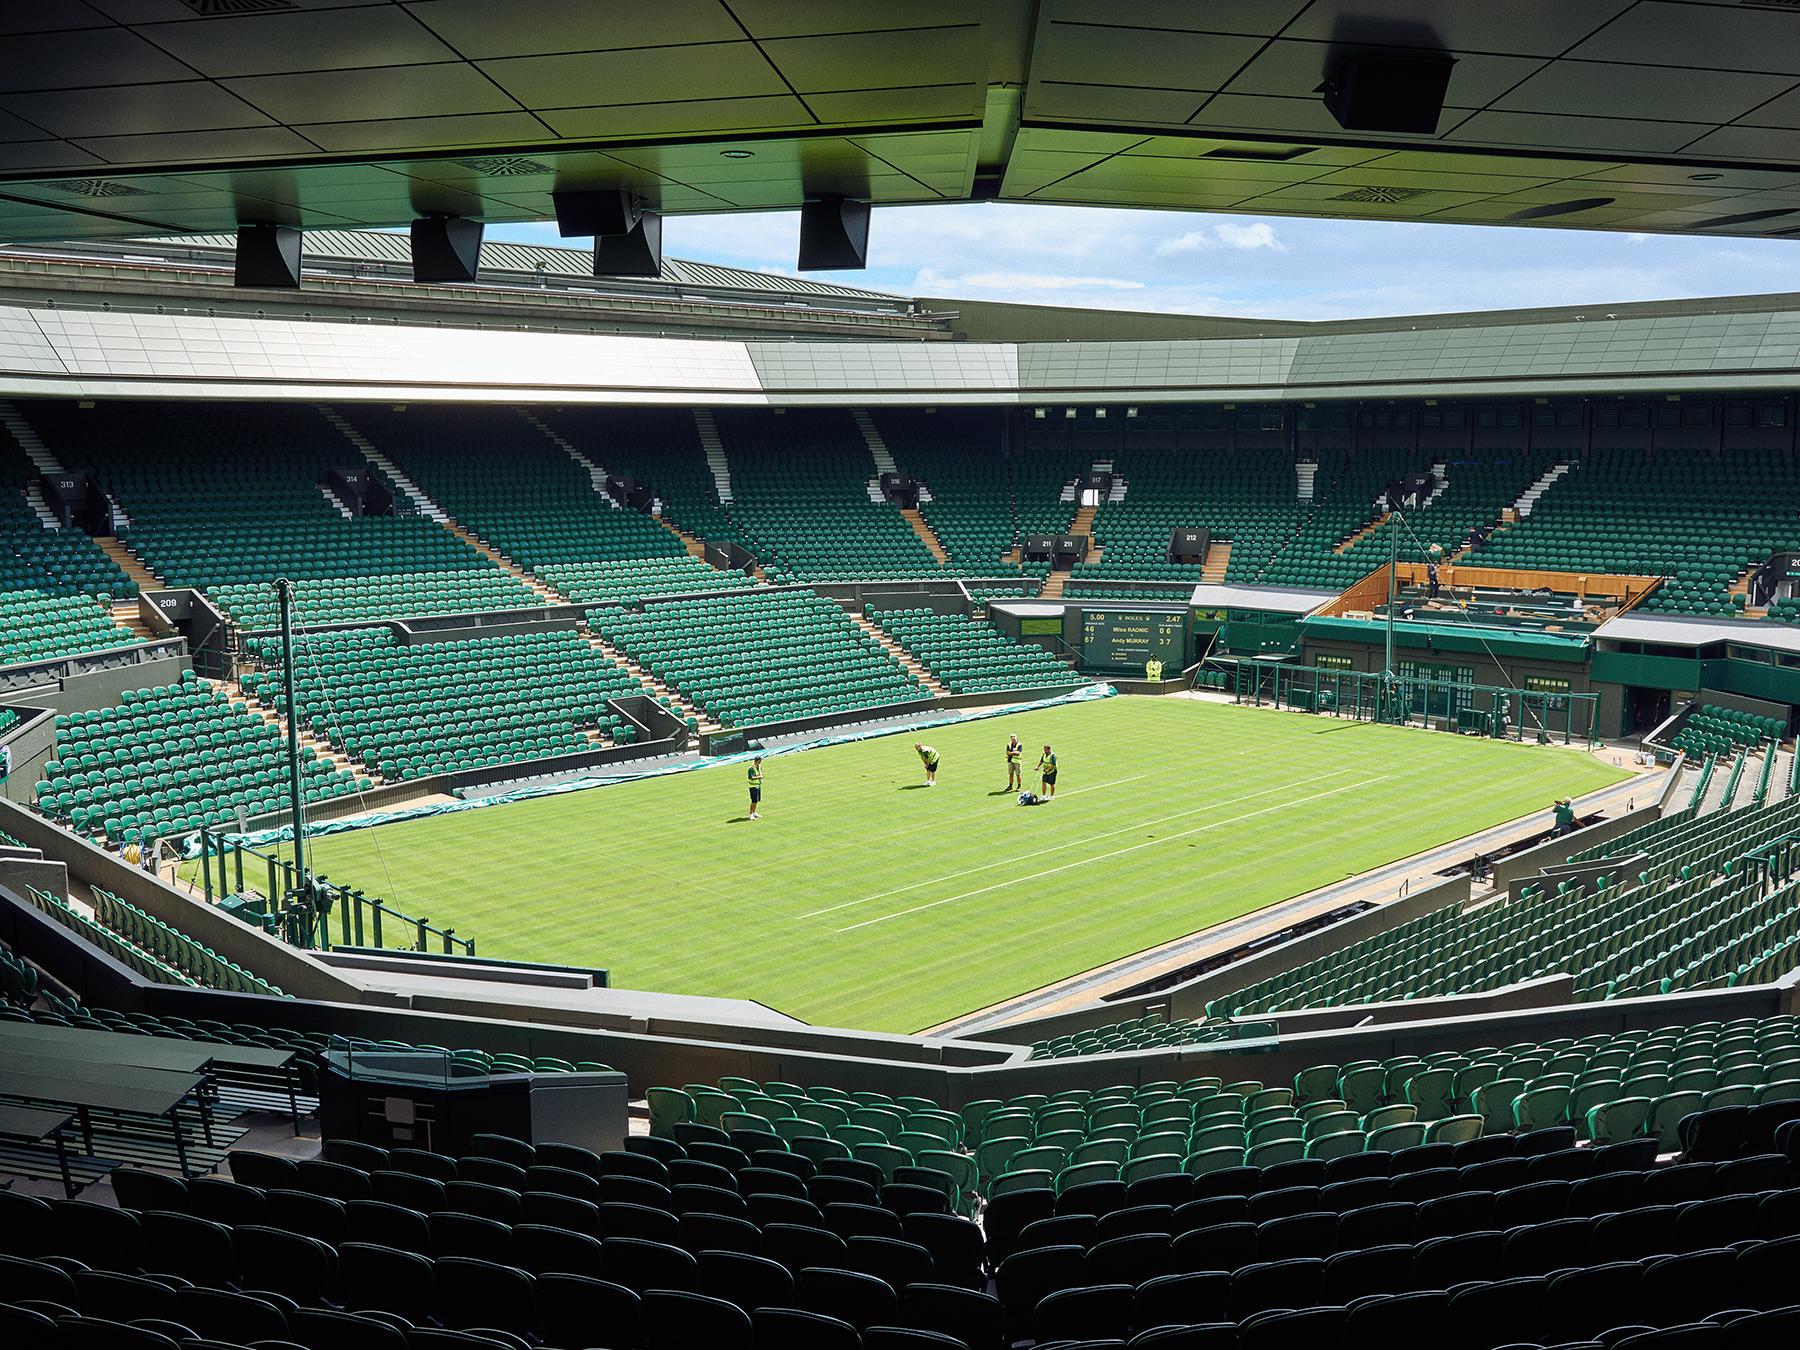 Wimbledon_Centre_Court_JamieMcgregorsmith.jpg